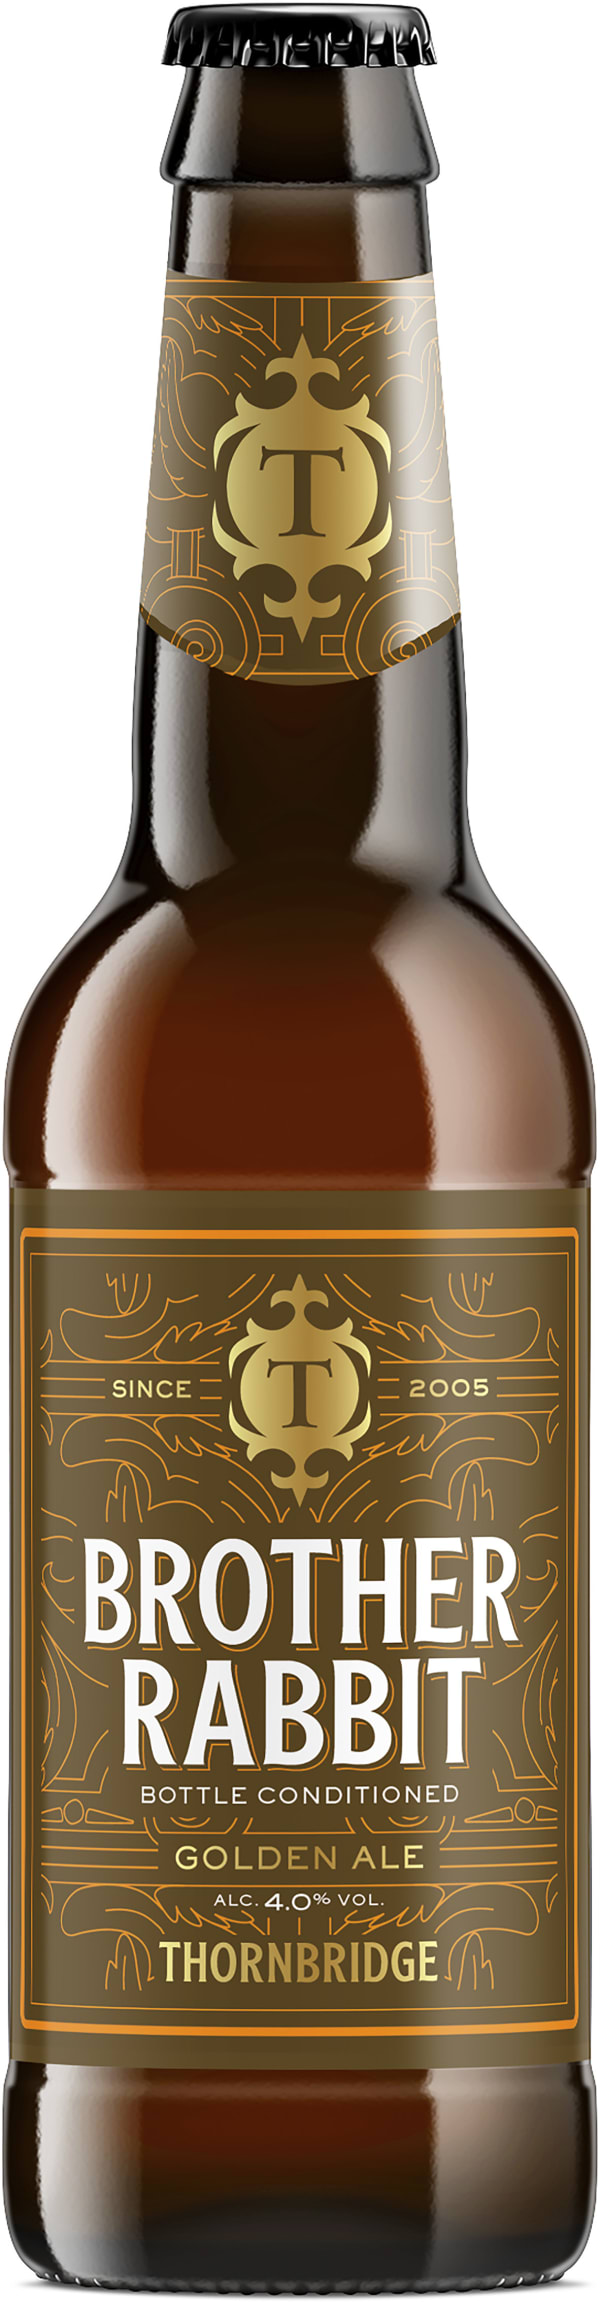 Thornbridge Brother Rabbit Golden Ale